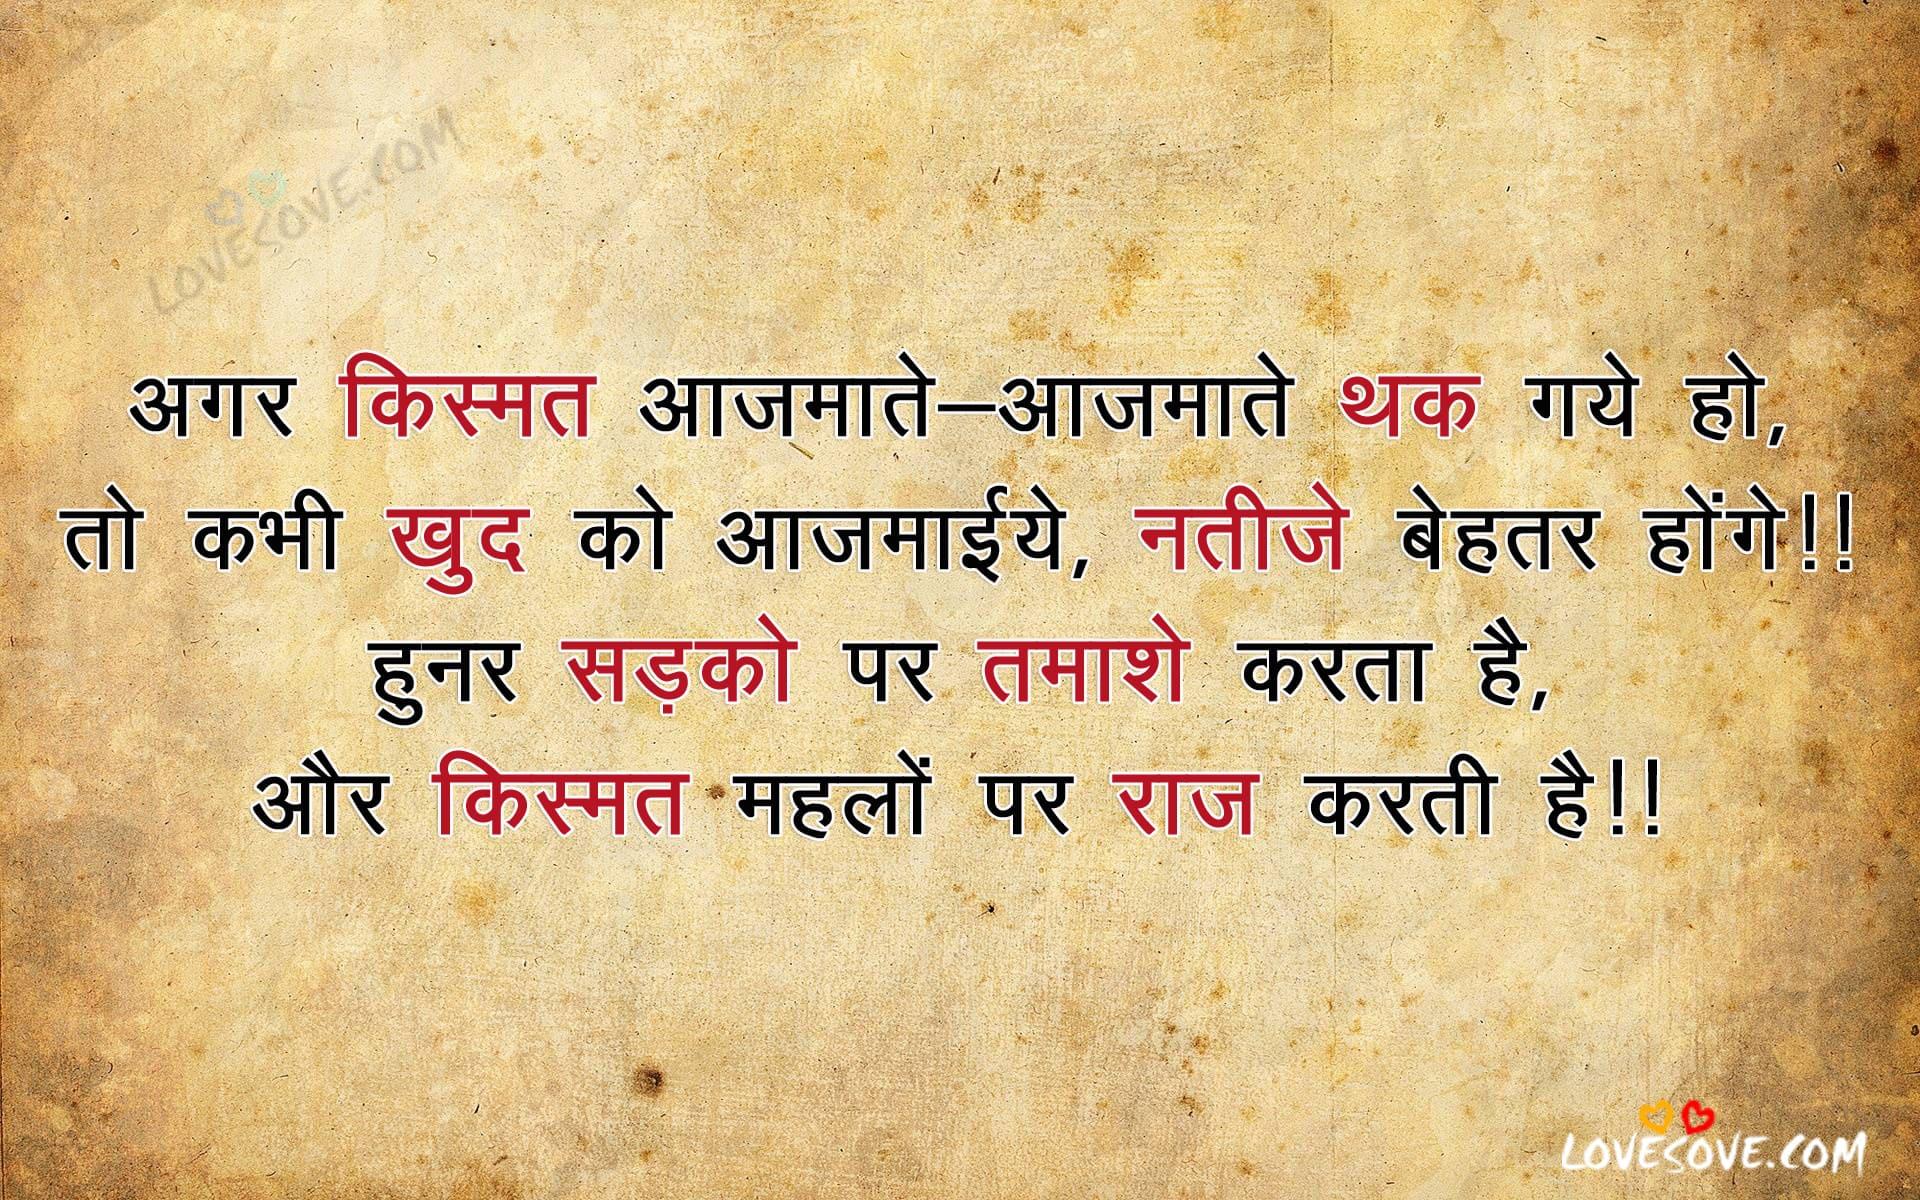 Hindi Suvichar, Suvichar in hindi, अगर किस्मत आज़माते-आज़माते थक गये हों - Life Quote